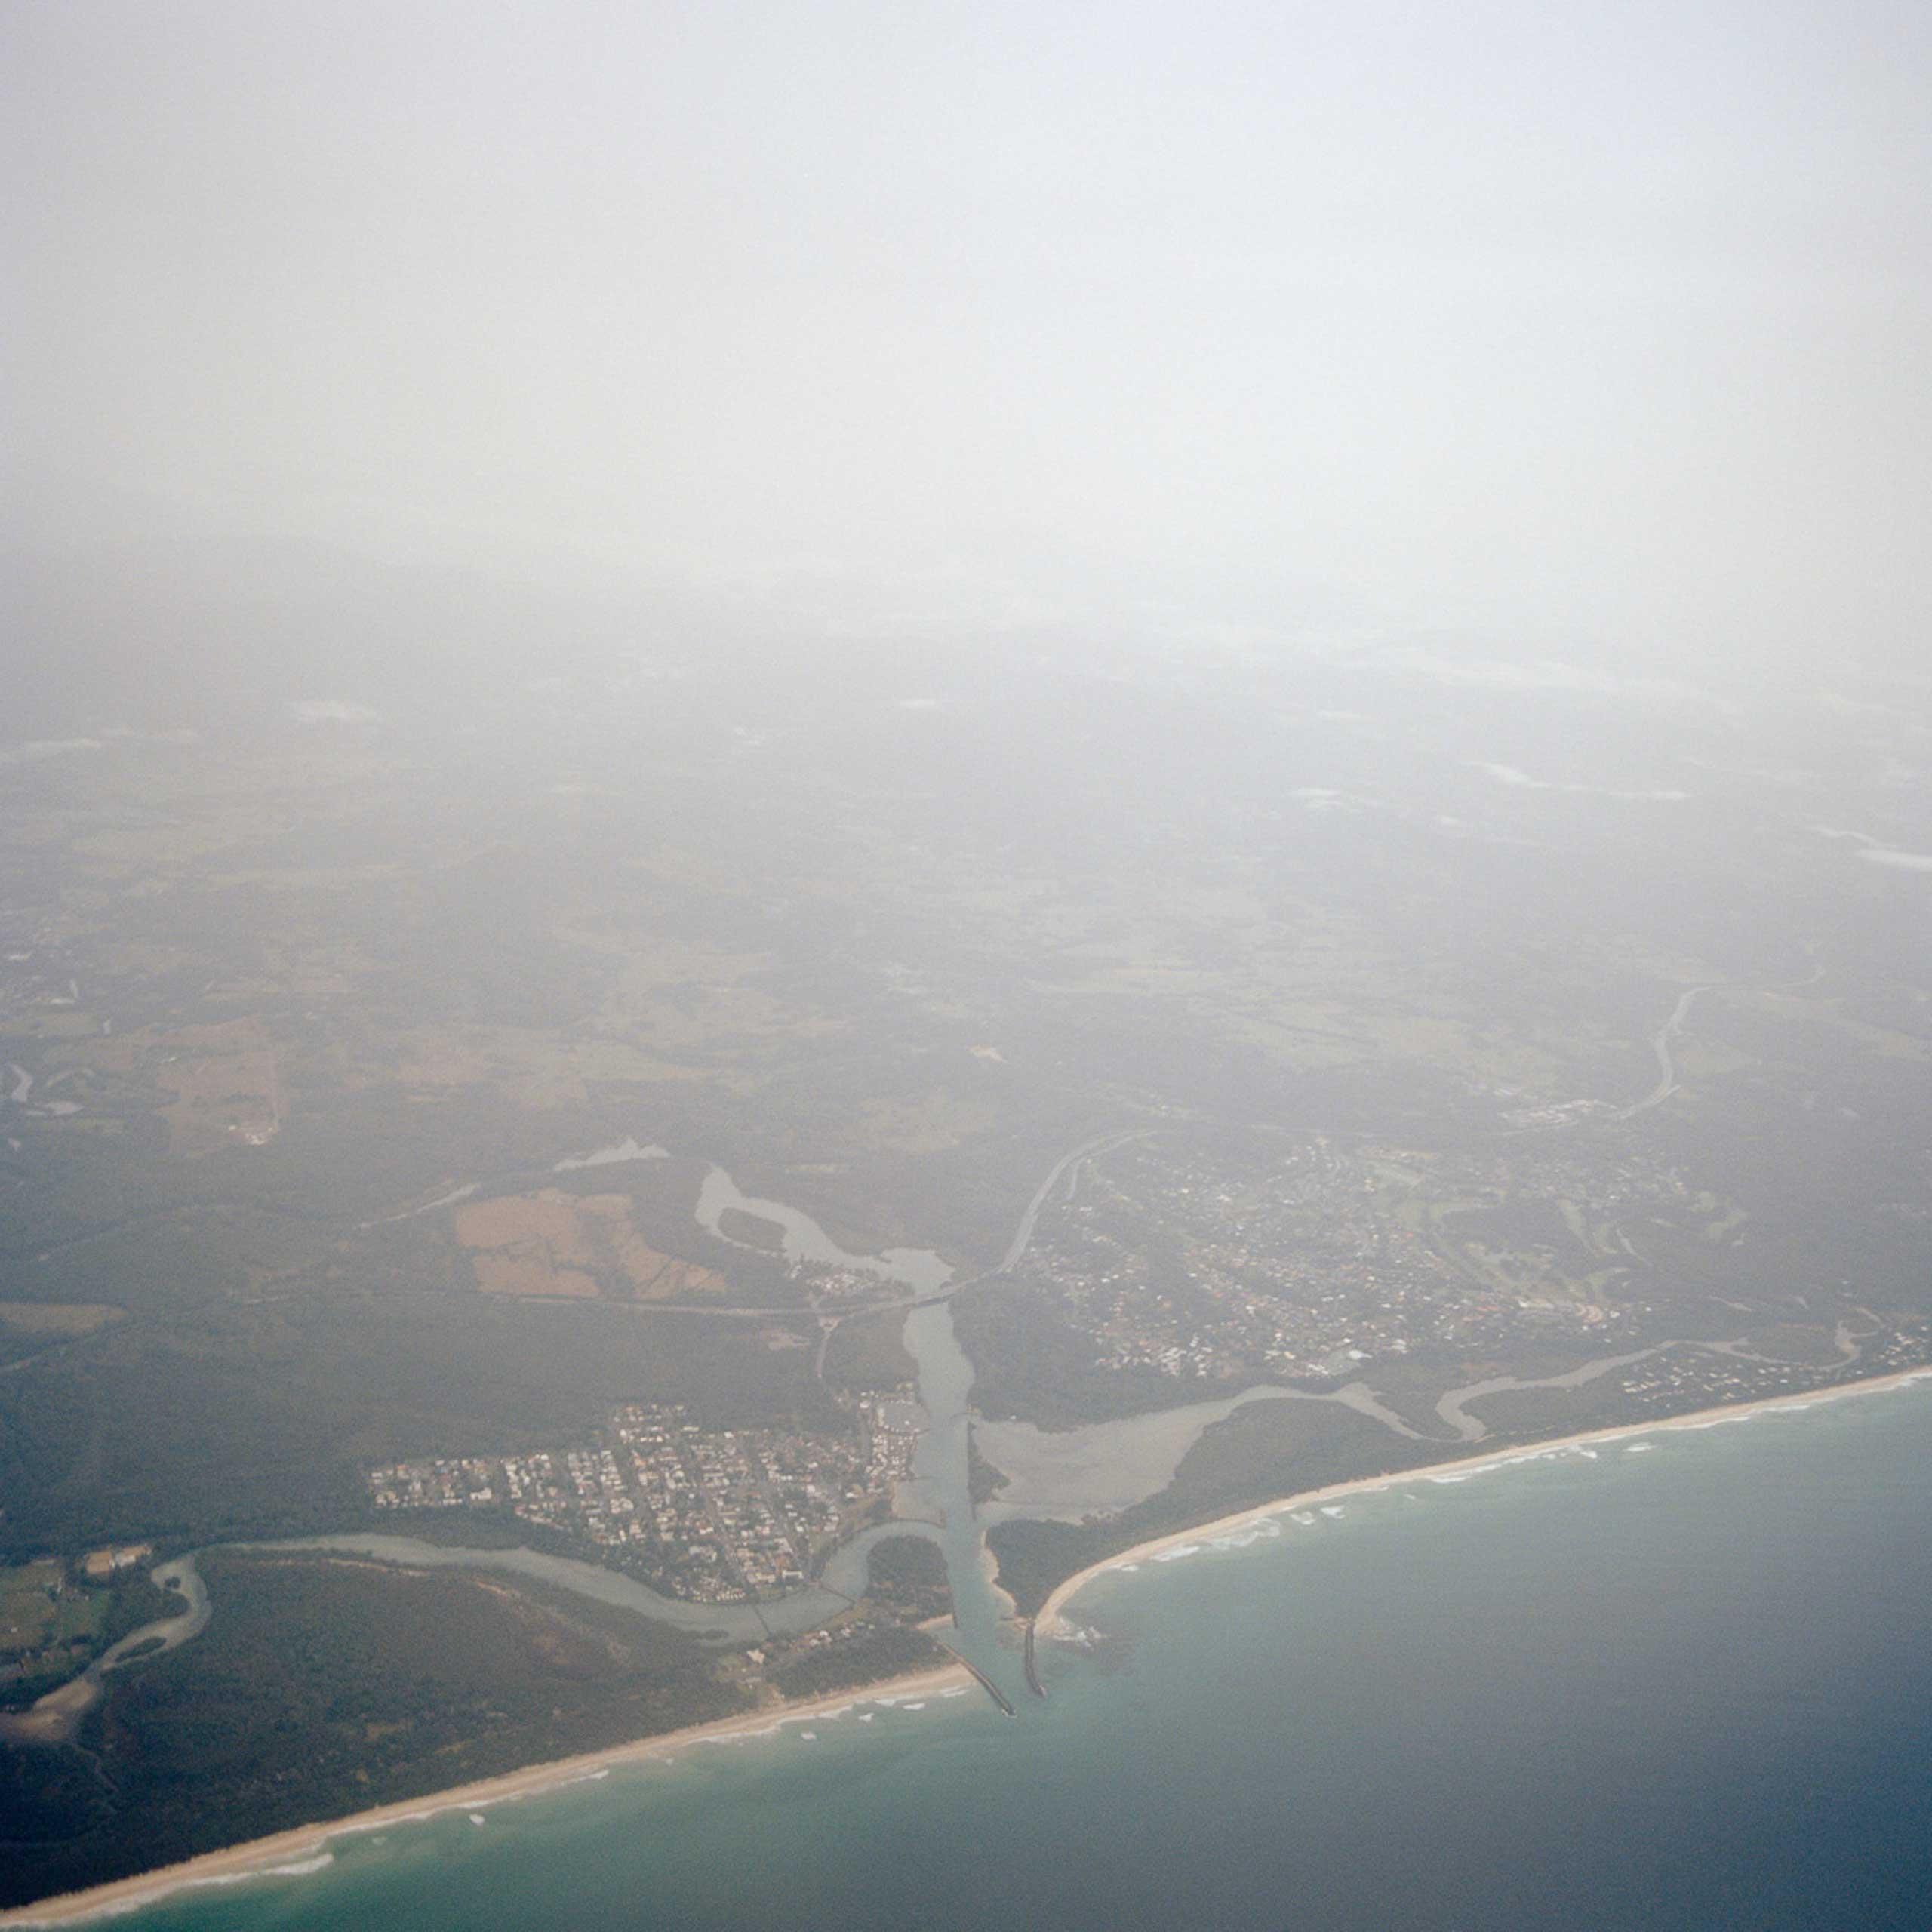 The Seaway.